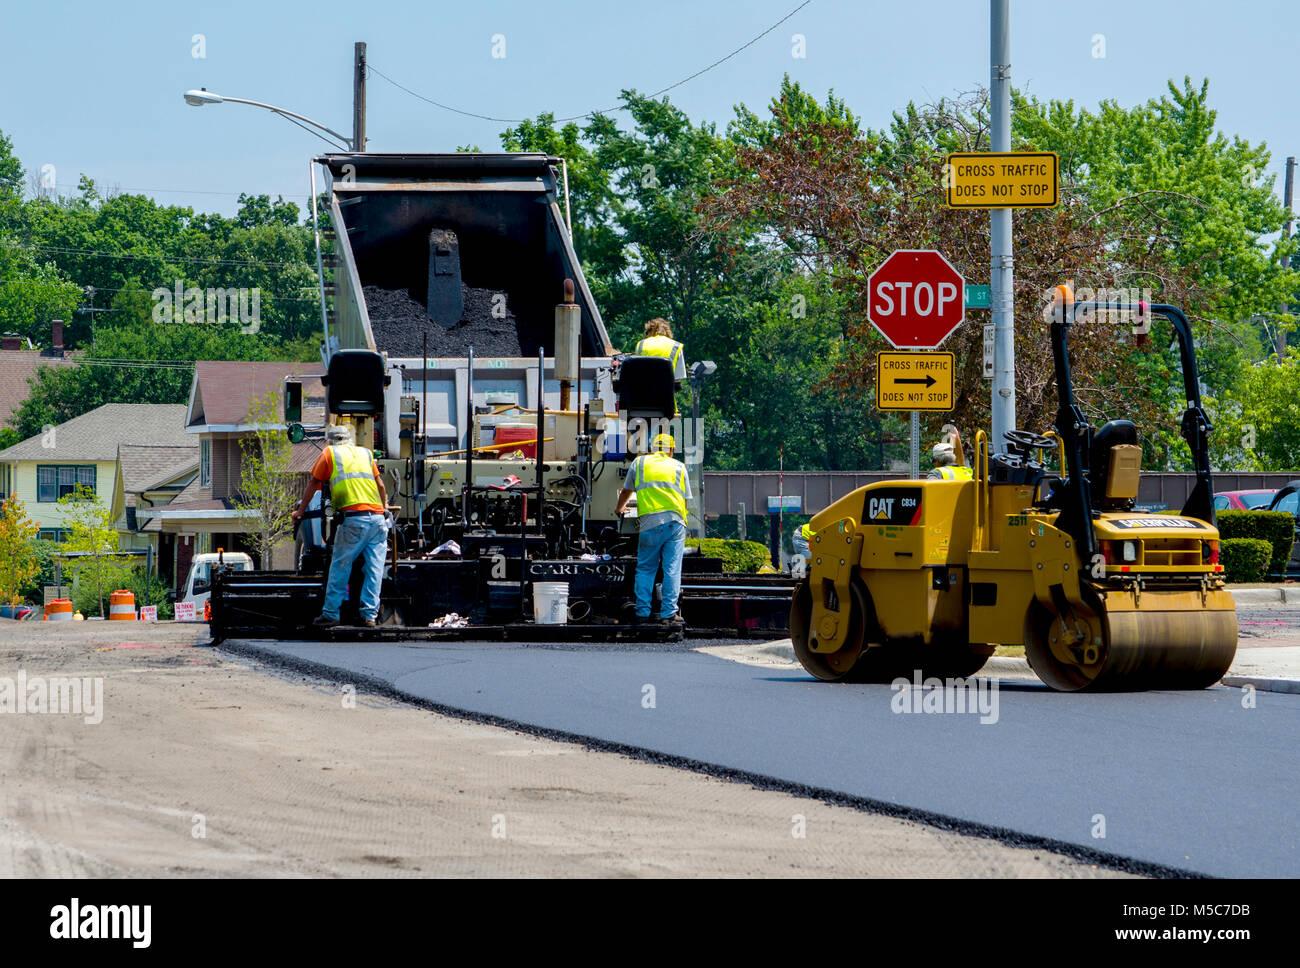 construction road crew work on putting down fresh asphalt on a city street - Stock Image